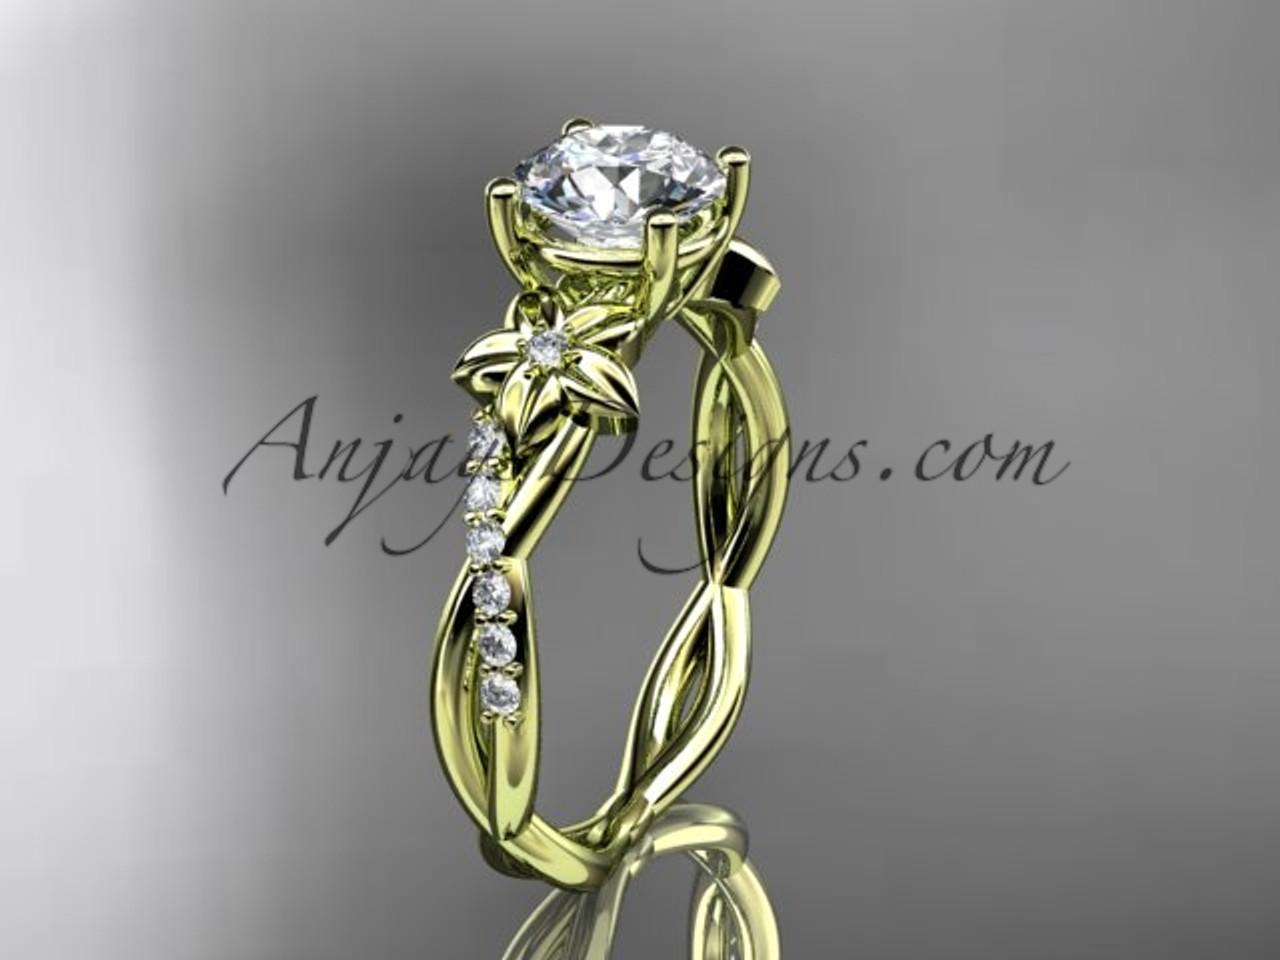 14kt yellow gold flower diamond wedding ring 14kt yellow gold flower diamond wedding ring engagement ring adlr388 mightylinksfo